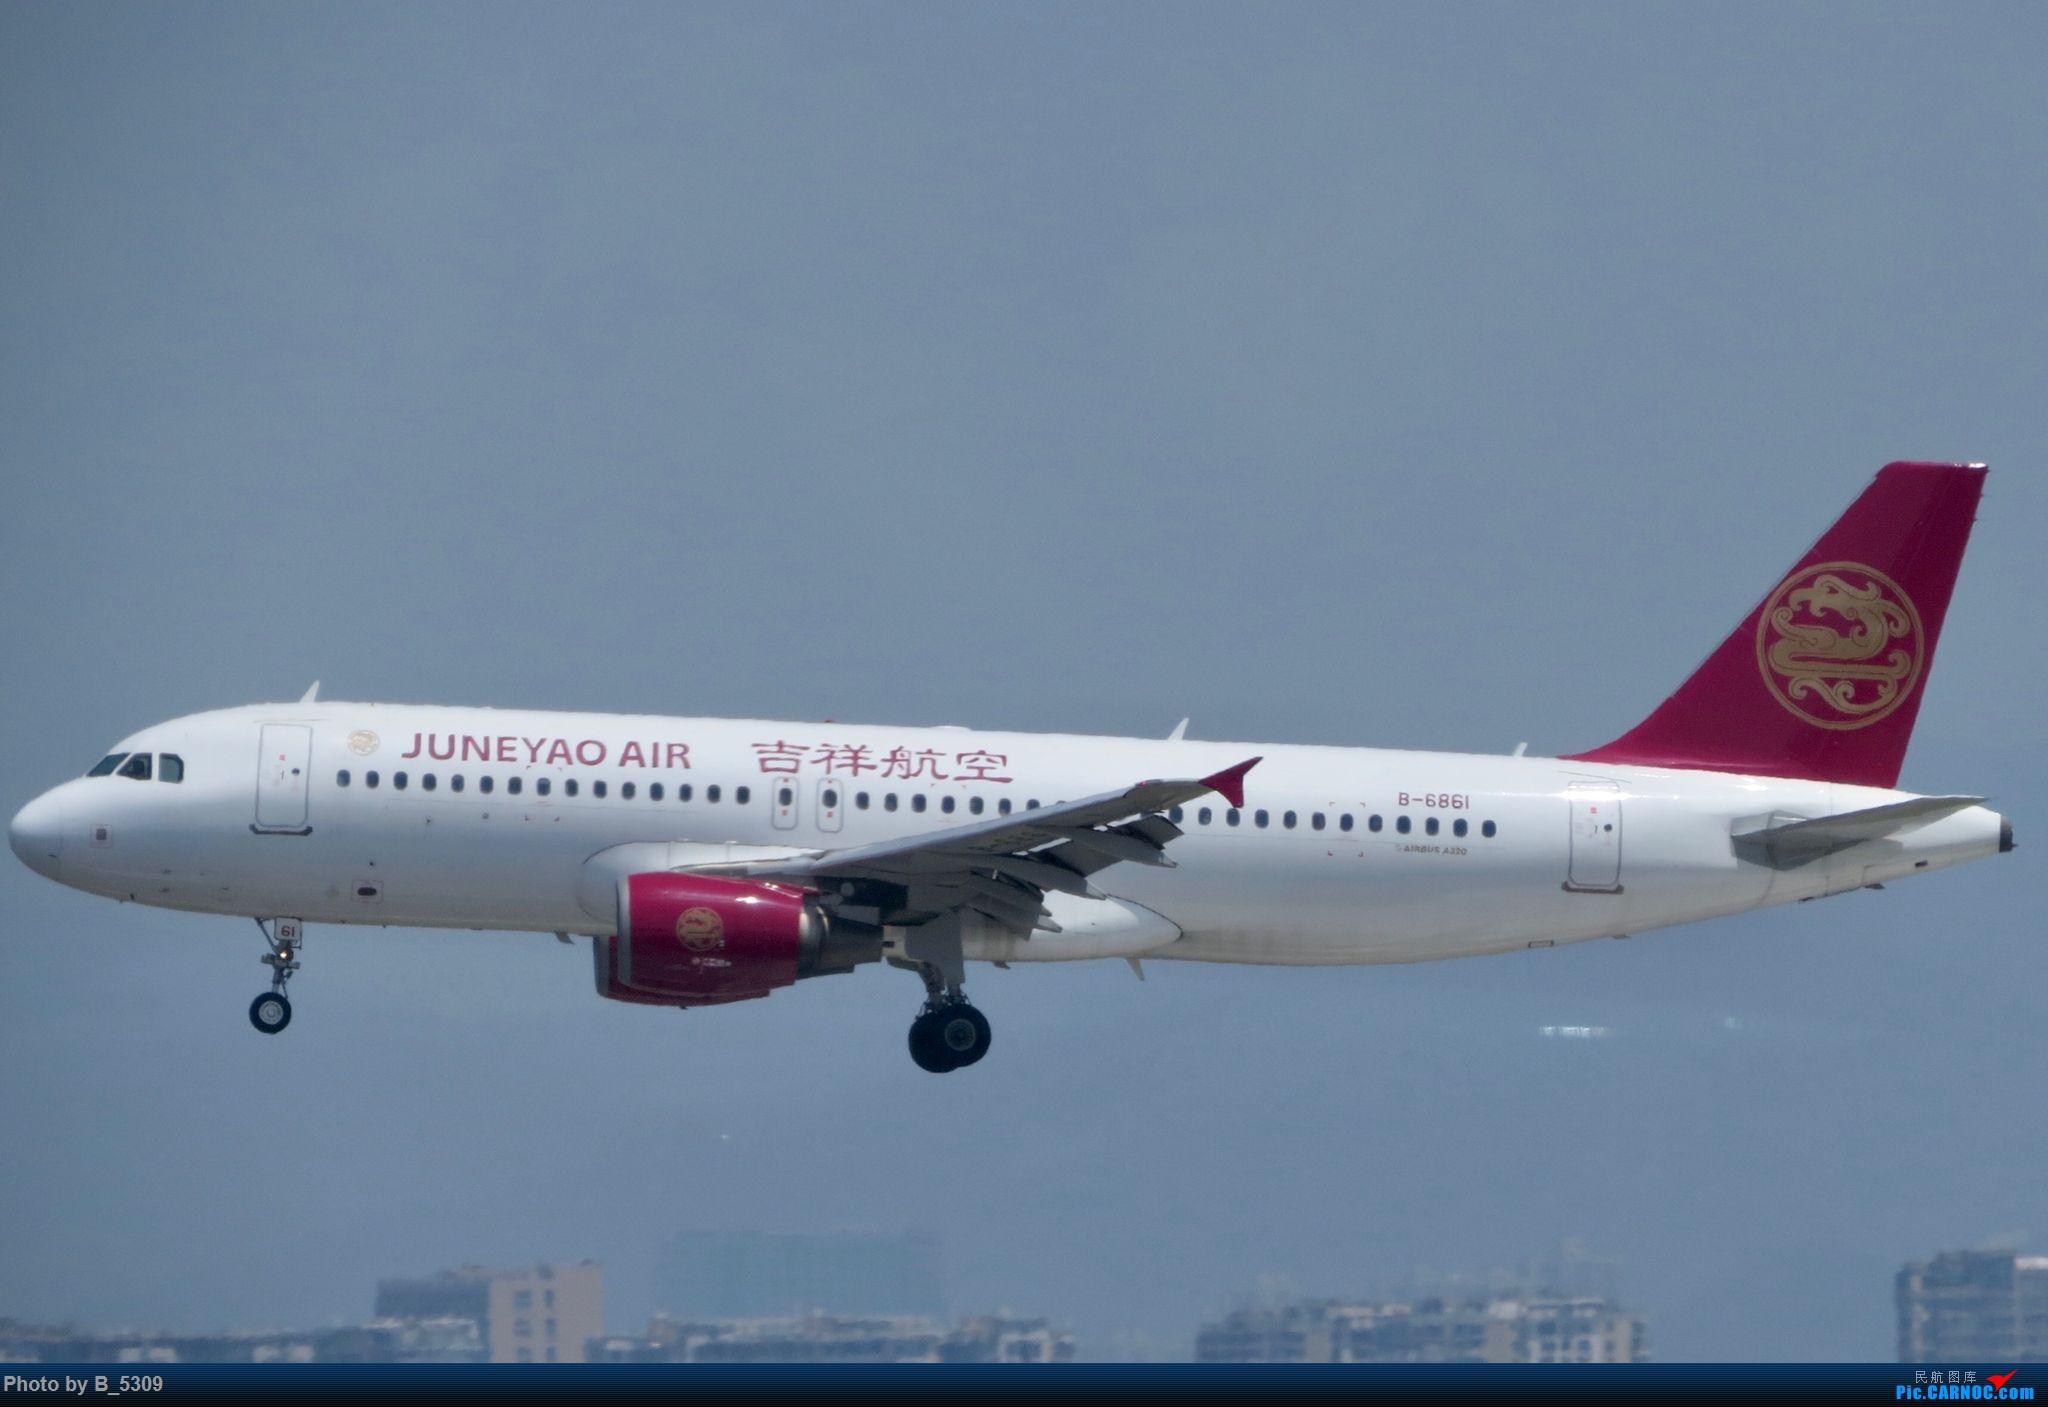 Re:[原创]逮KLM的大中午… AIRBUS A320-200 B-6861 中国厦门高崎国际机场